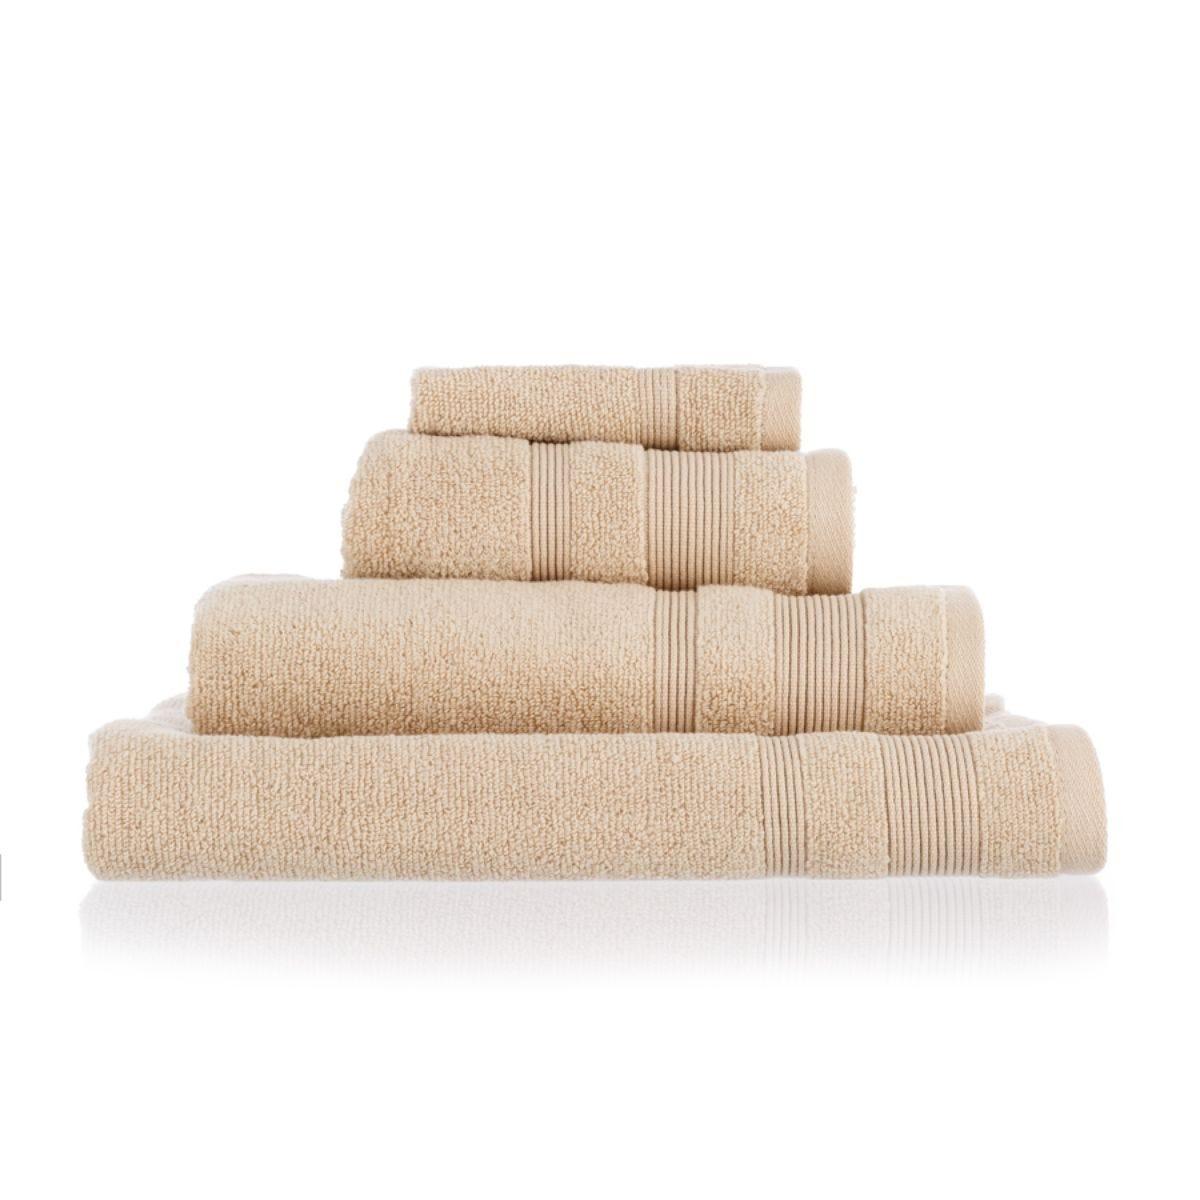 Allure Zero Twist Bath Sheet - Stone